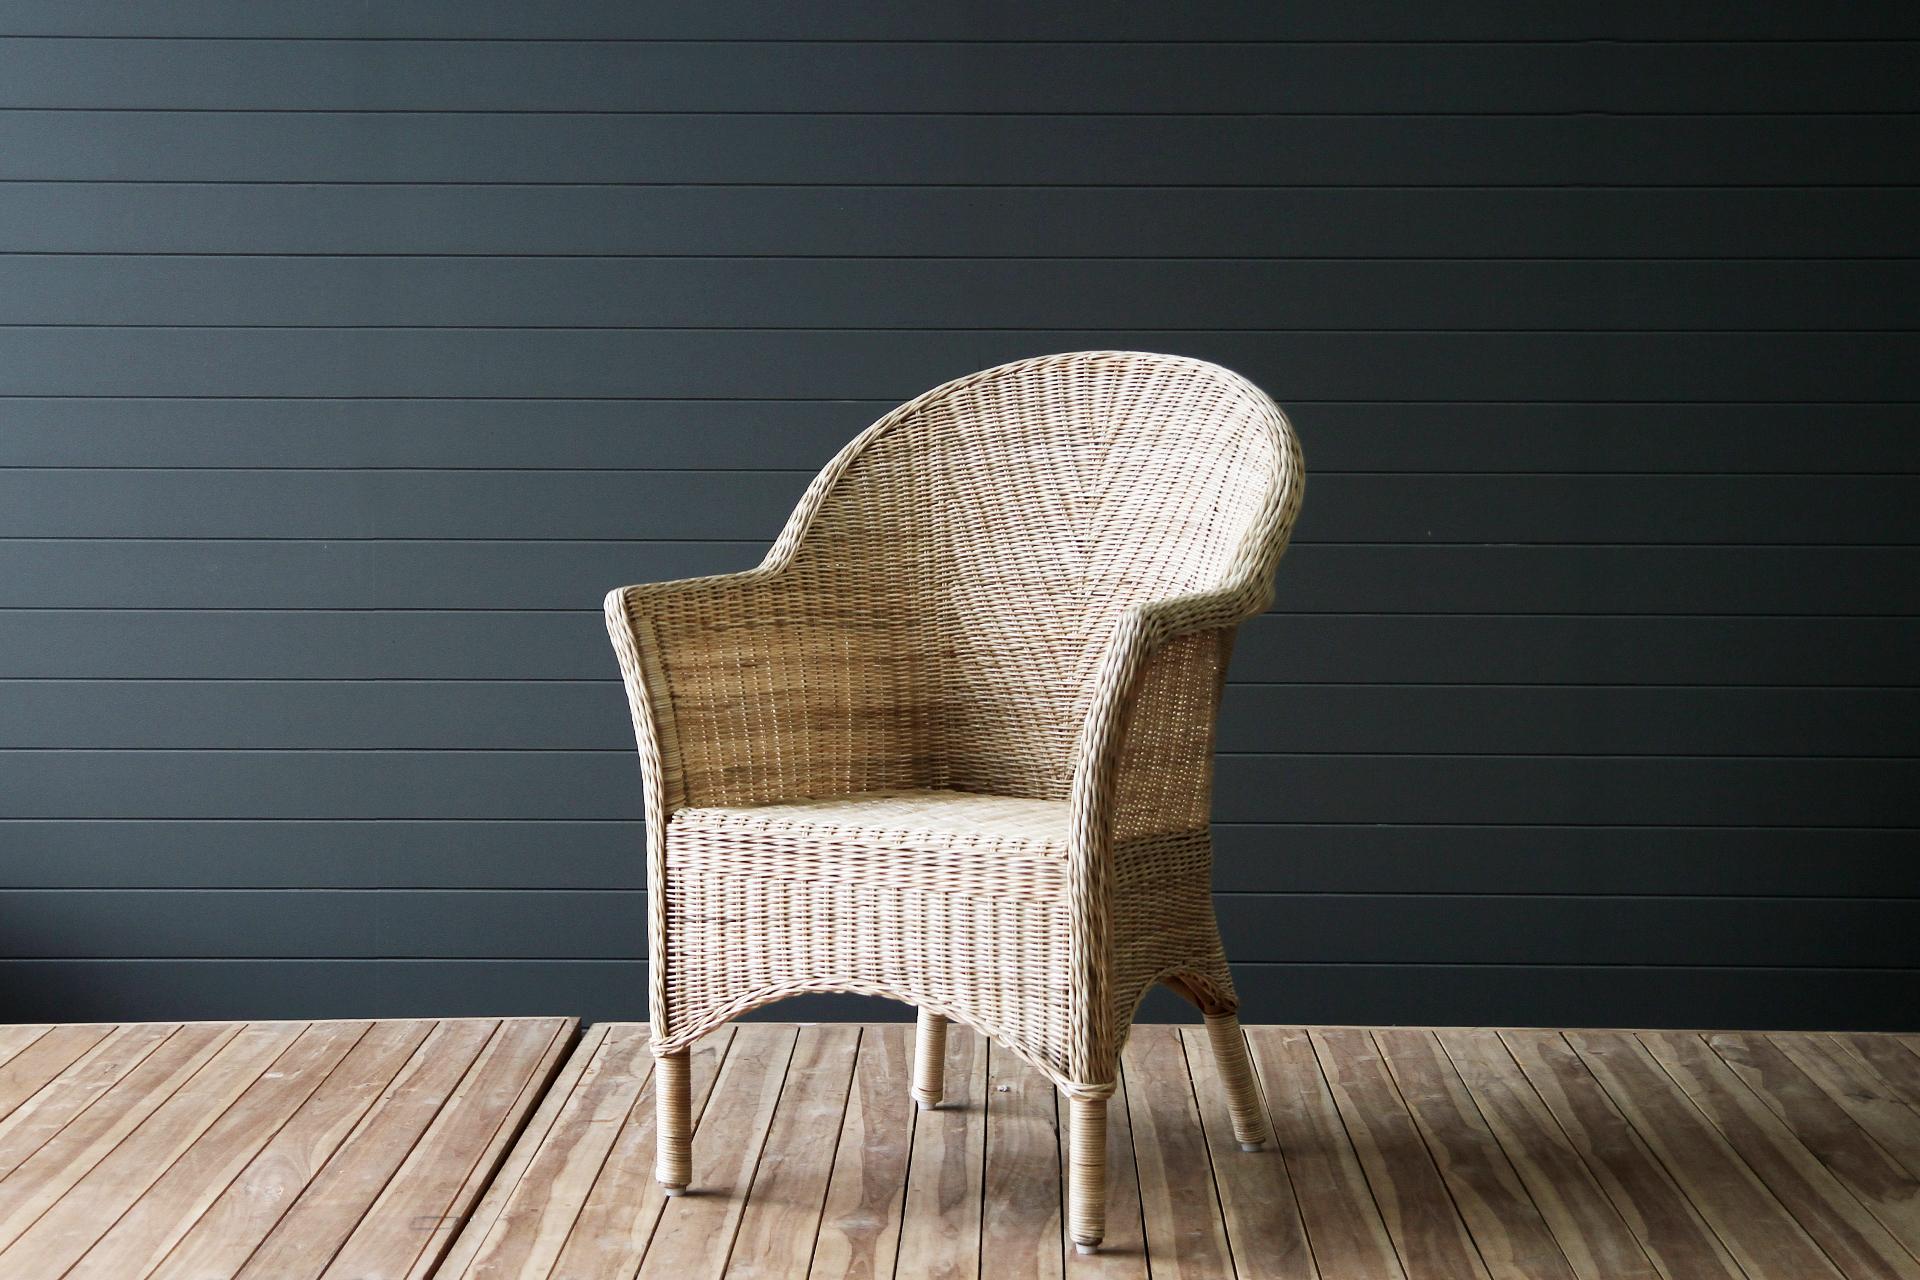 Batavia Fine Weave Dining Chair Naturally Cane Rattan